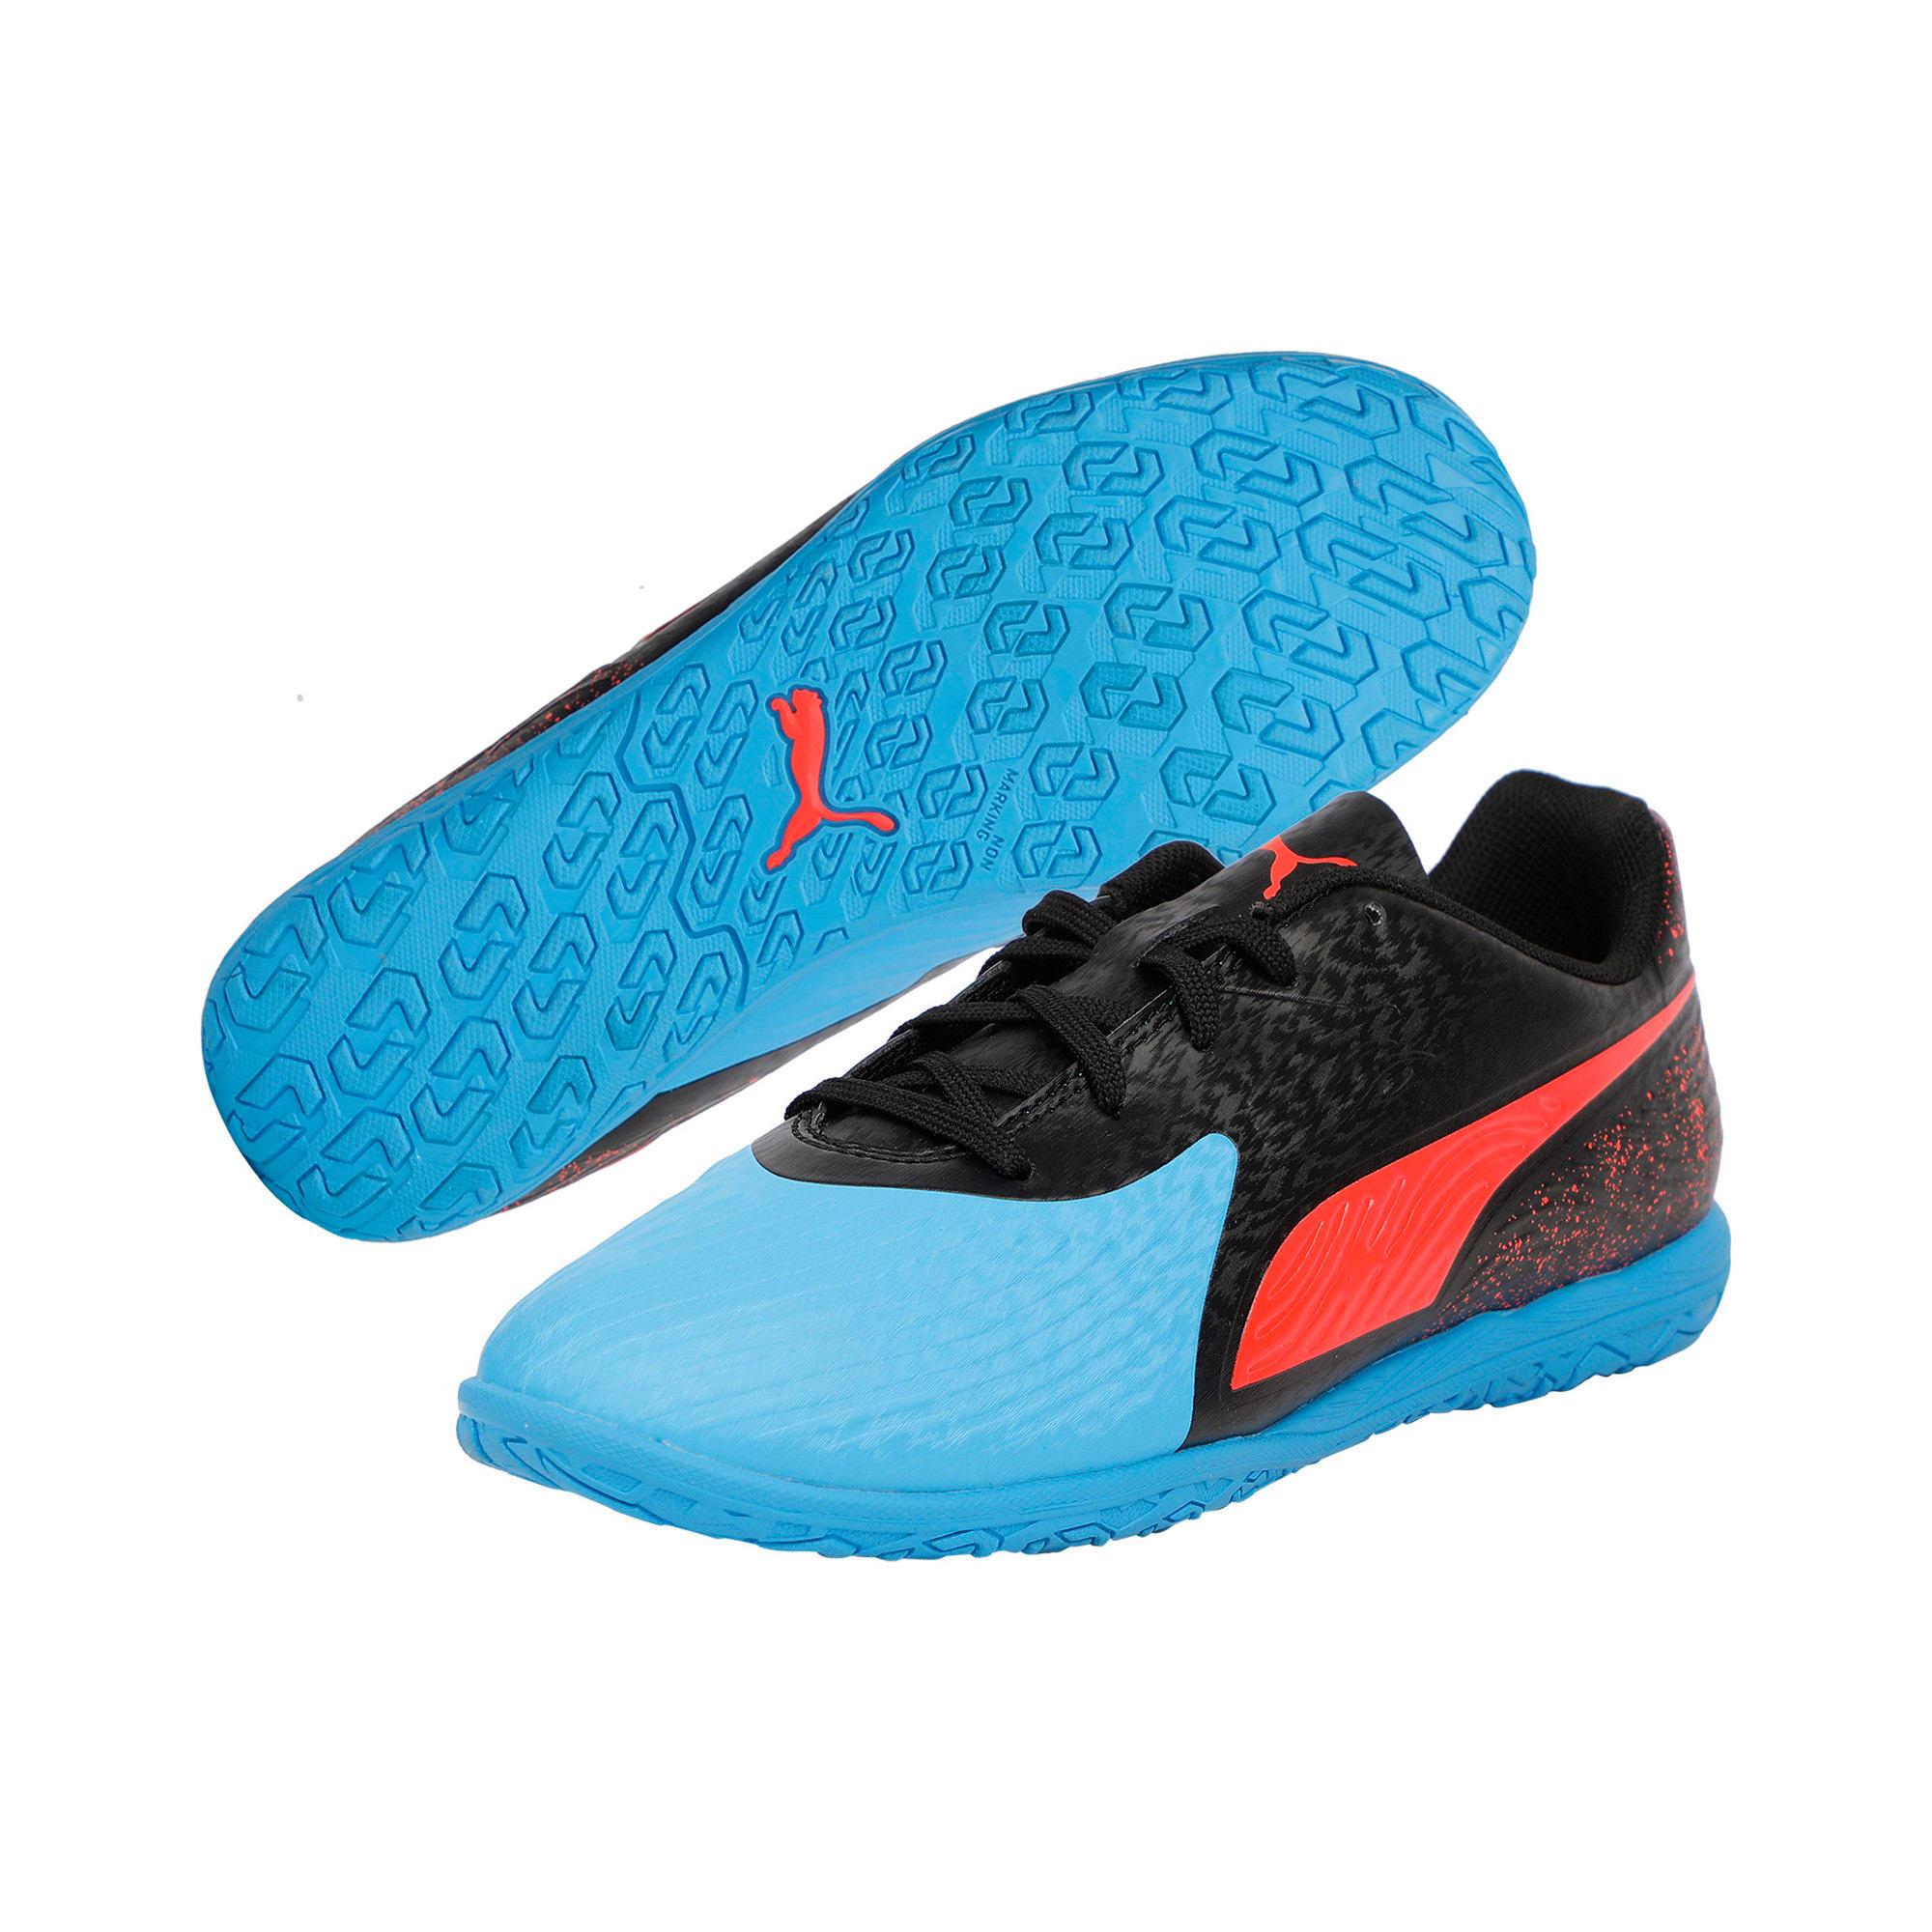 Thumbnail 2 of PUMA ONE 19.4 IT Youth Football Boots, Bleu Azur-Red Blast-Black, medium-IND